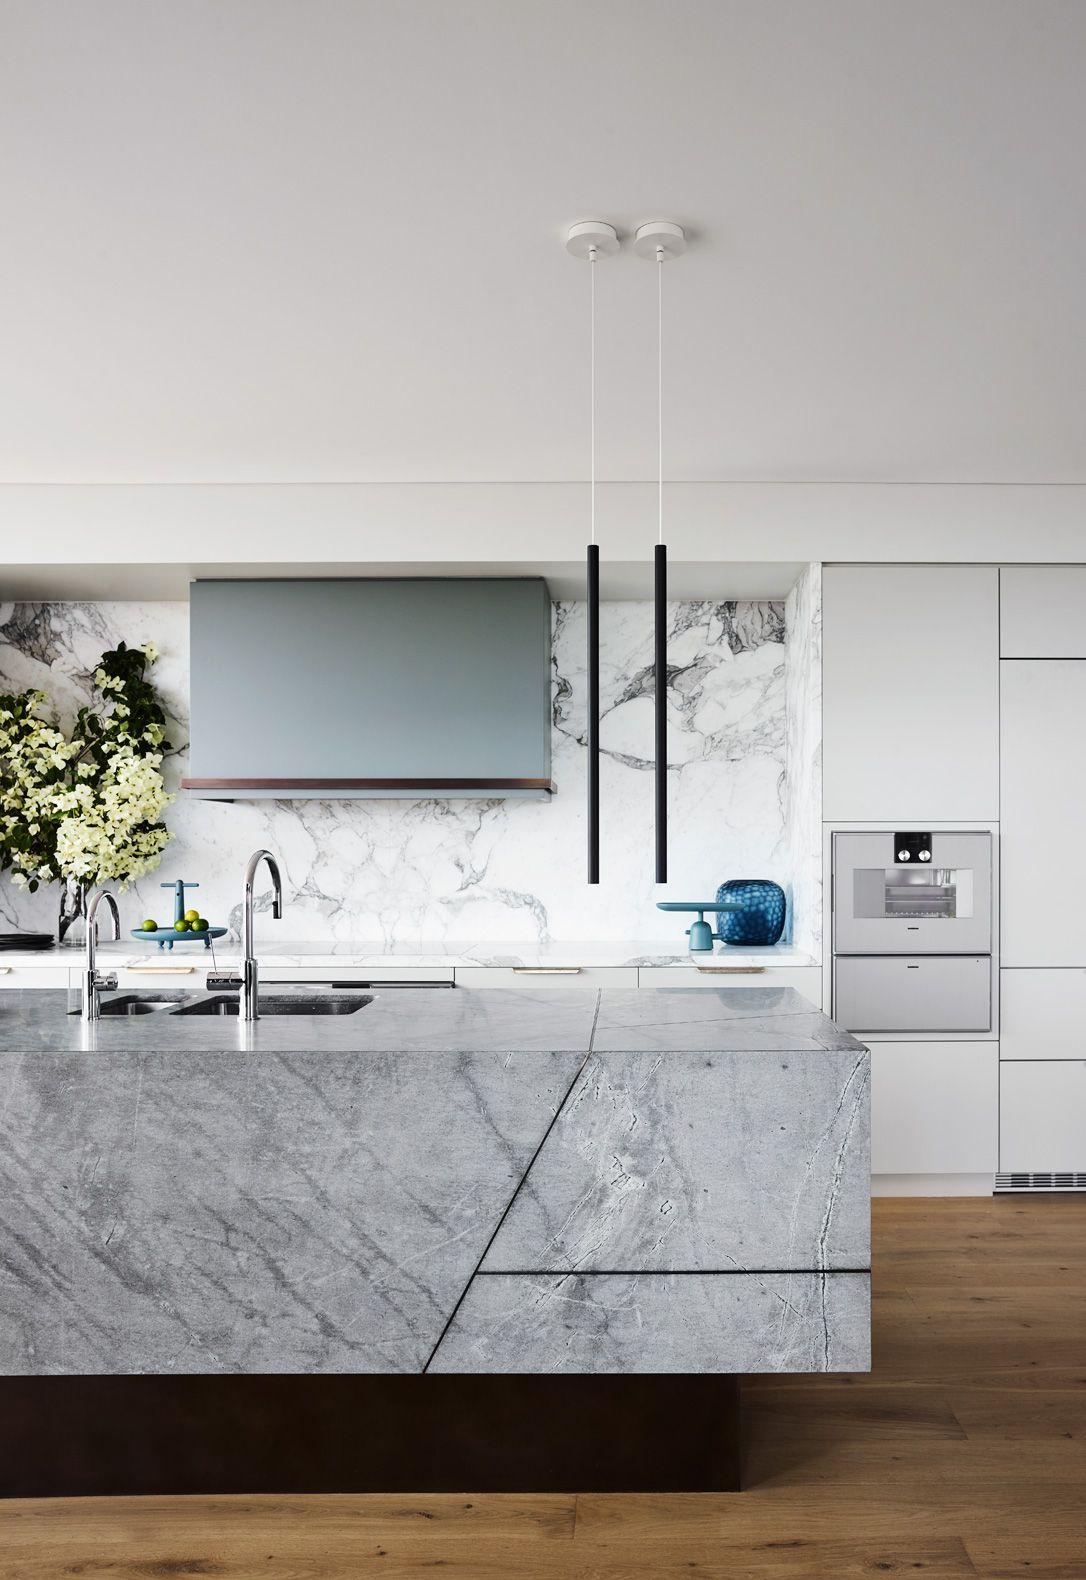 - 50 Best Kitchen Backsplash Ideas - Tile Designs For Kitchen